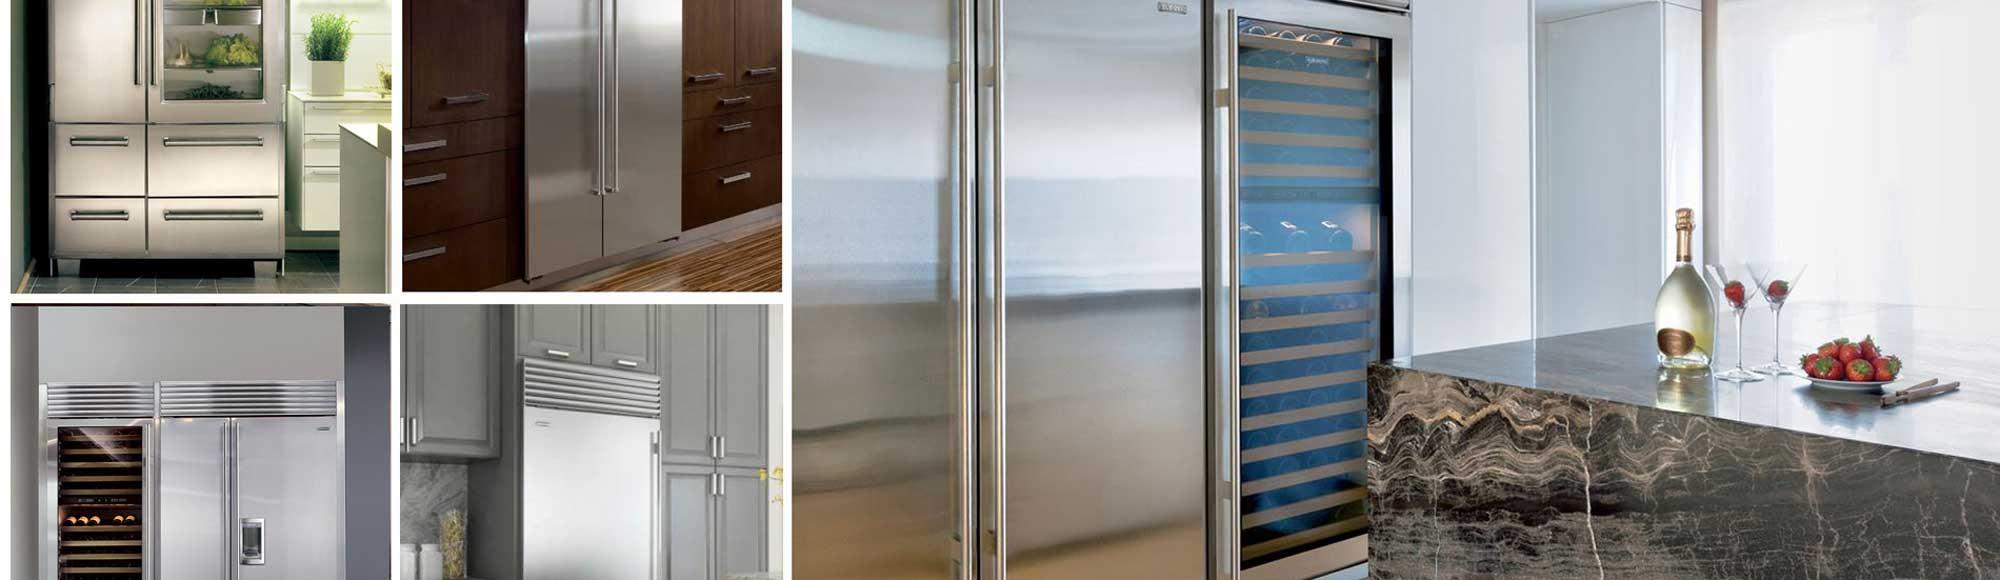 Various sizes of fridges